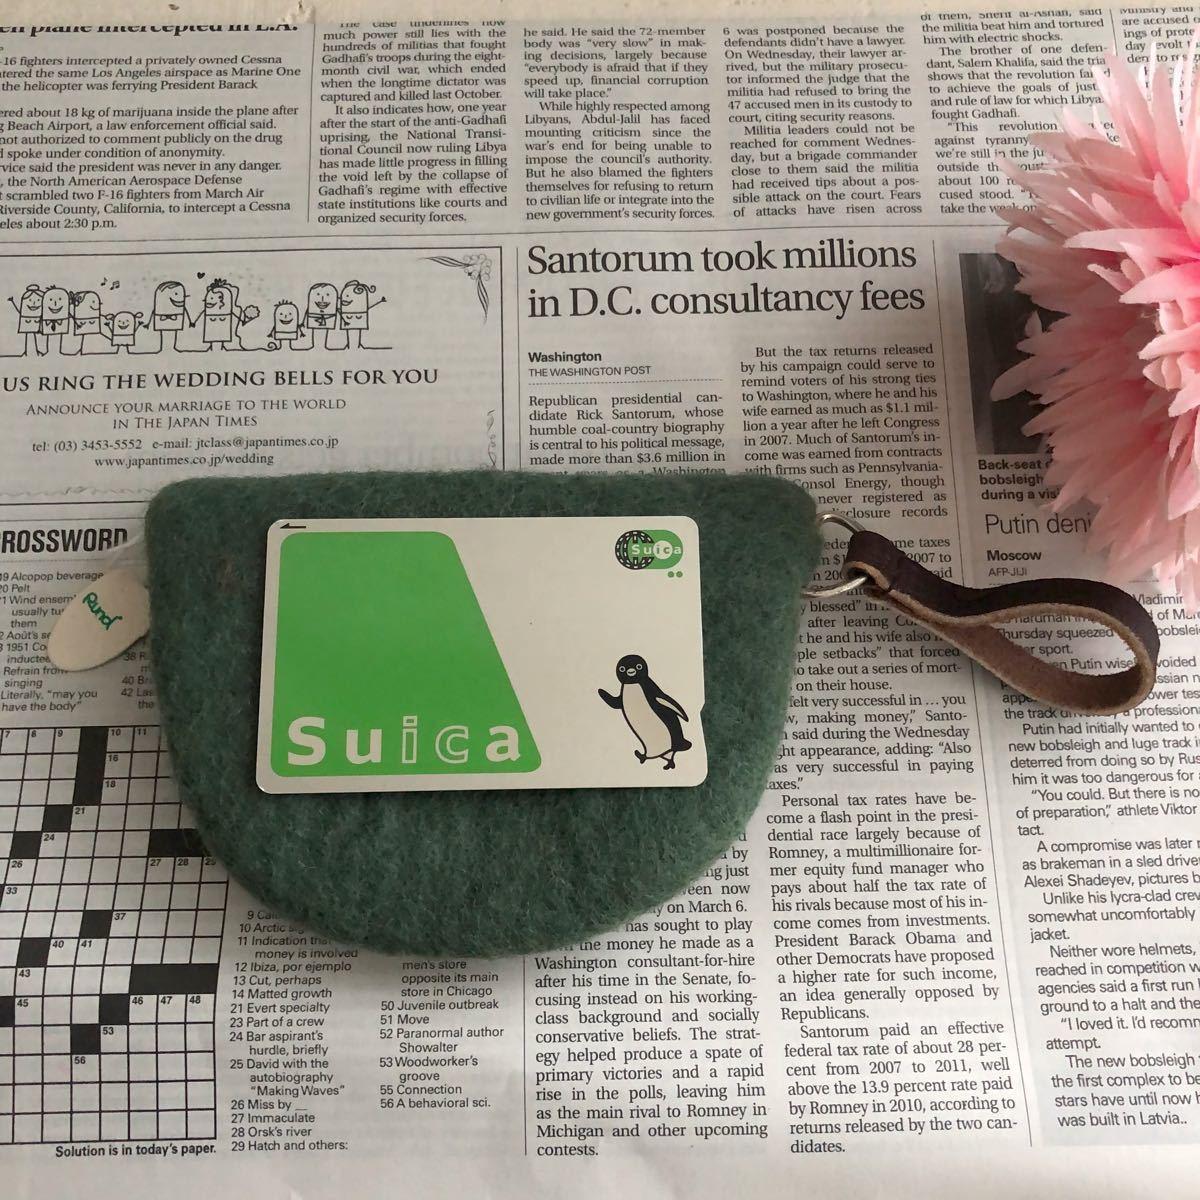 SALE! 新品 オリジナル 羊毛 フェルト カードポーチ ハンドメイド